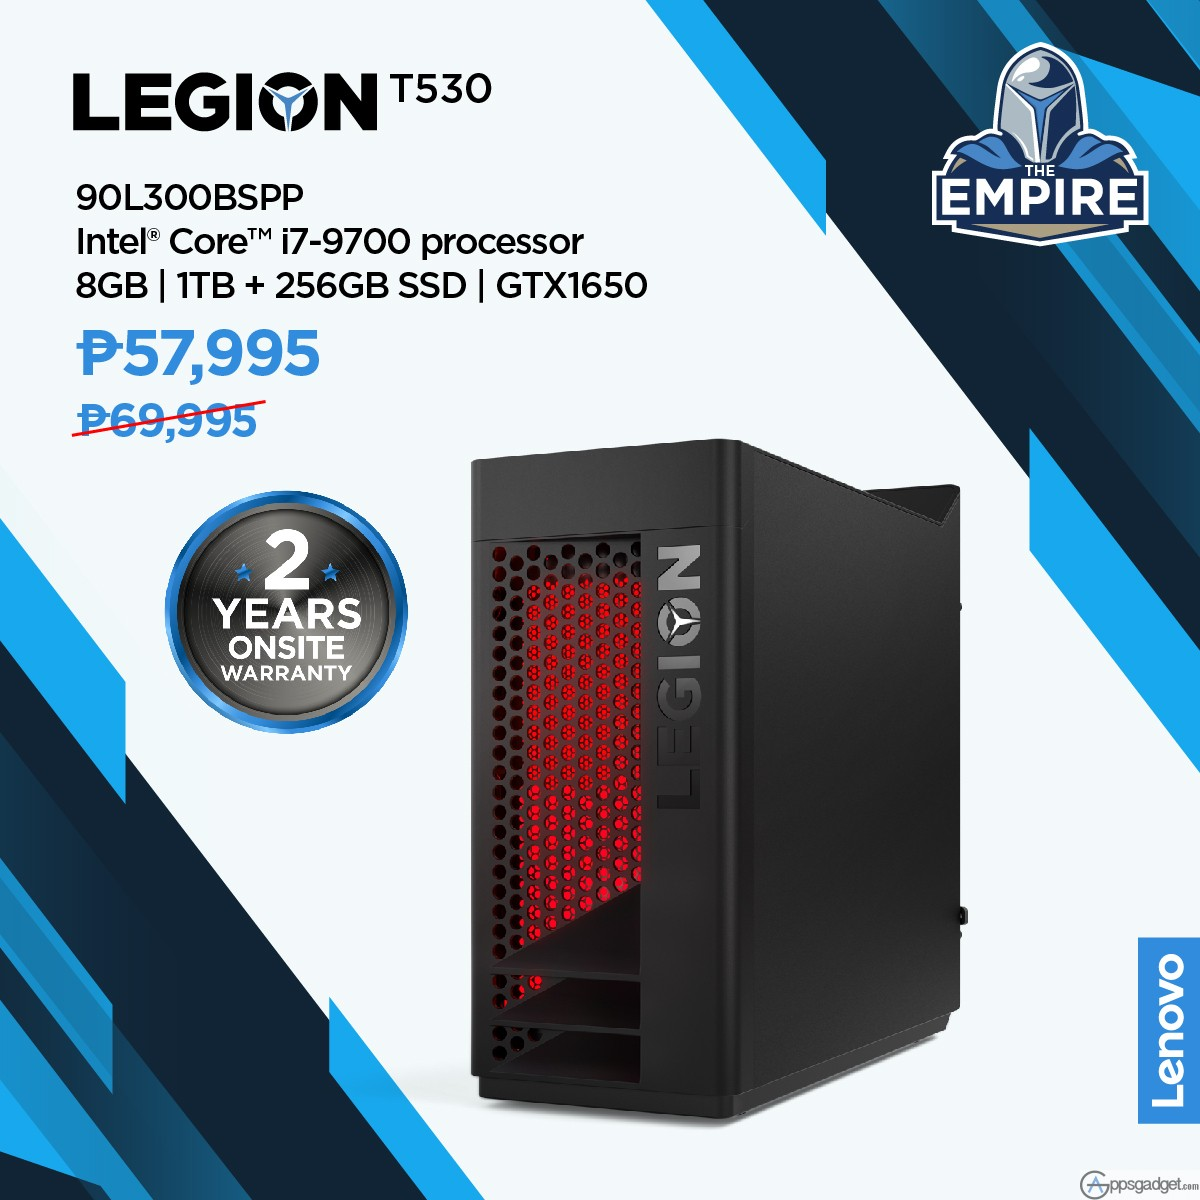 Lenovo Legion 'The Empire' Rewards Program for Gamers in its Gaming Community